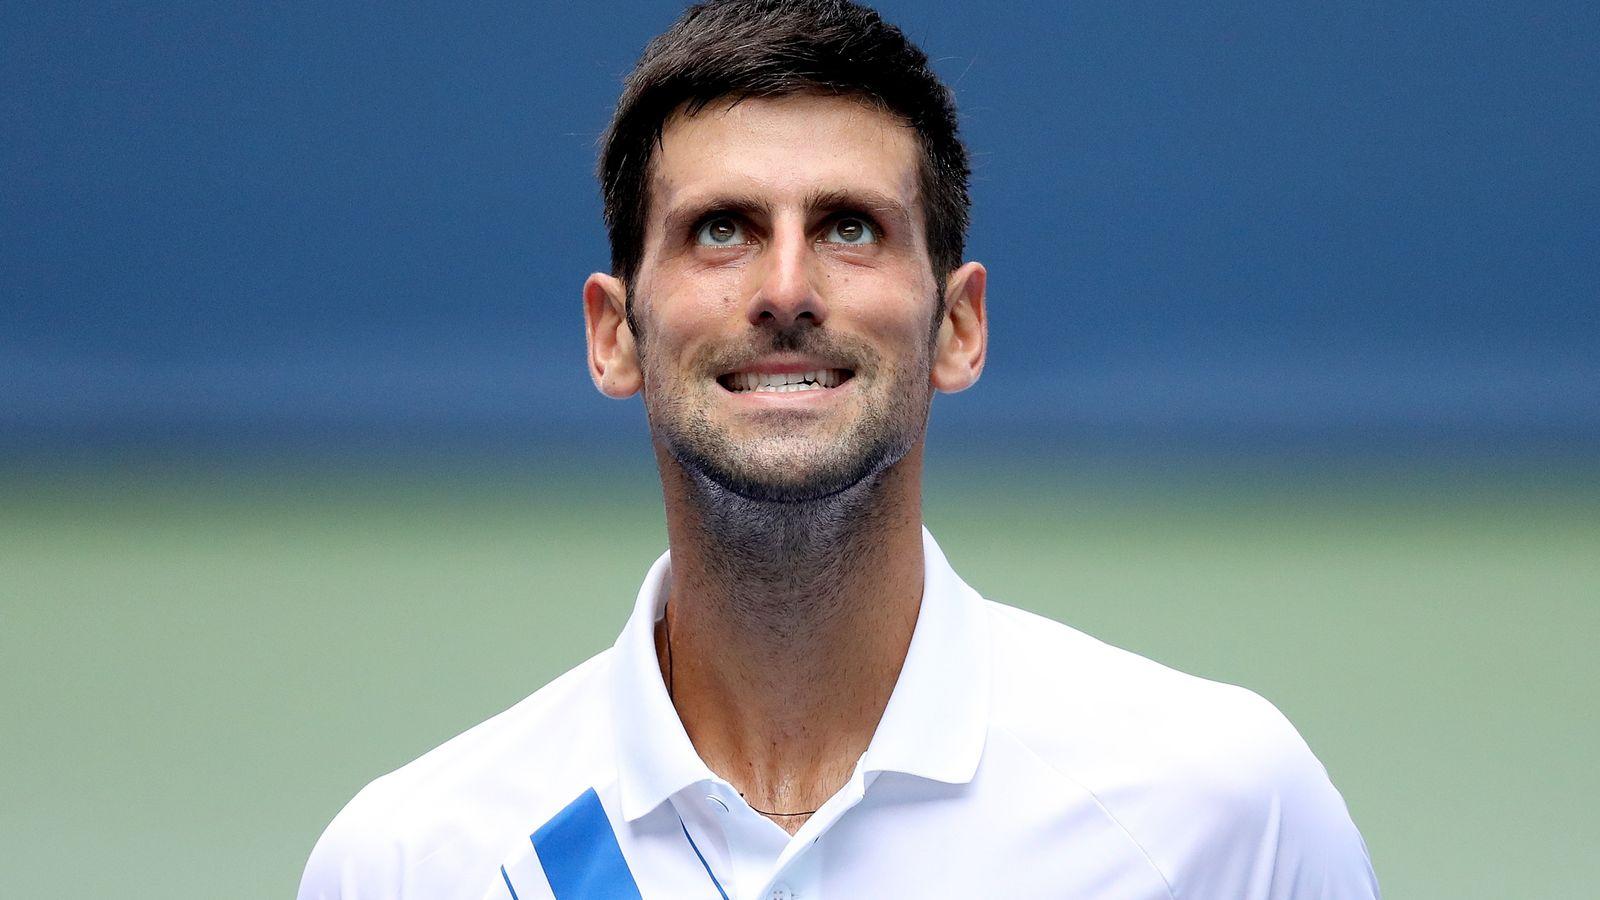 Novak Djokovic Says Women In Talks To Join Professional